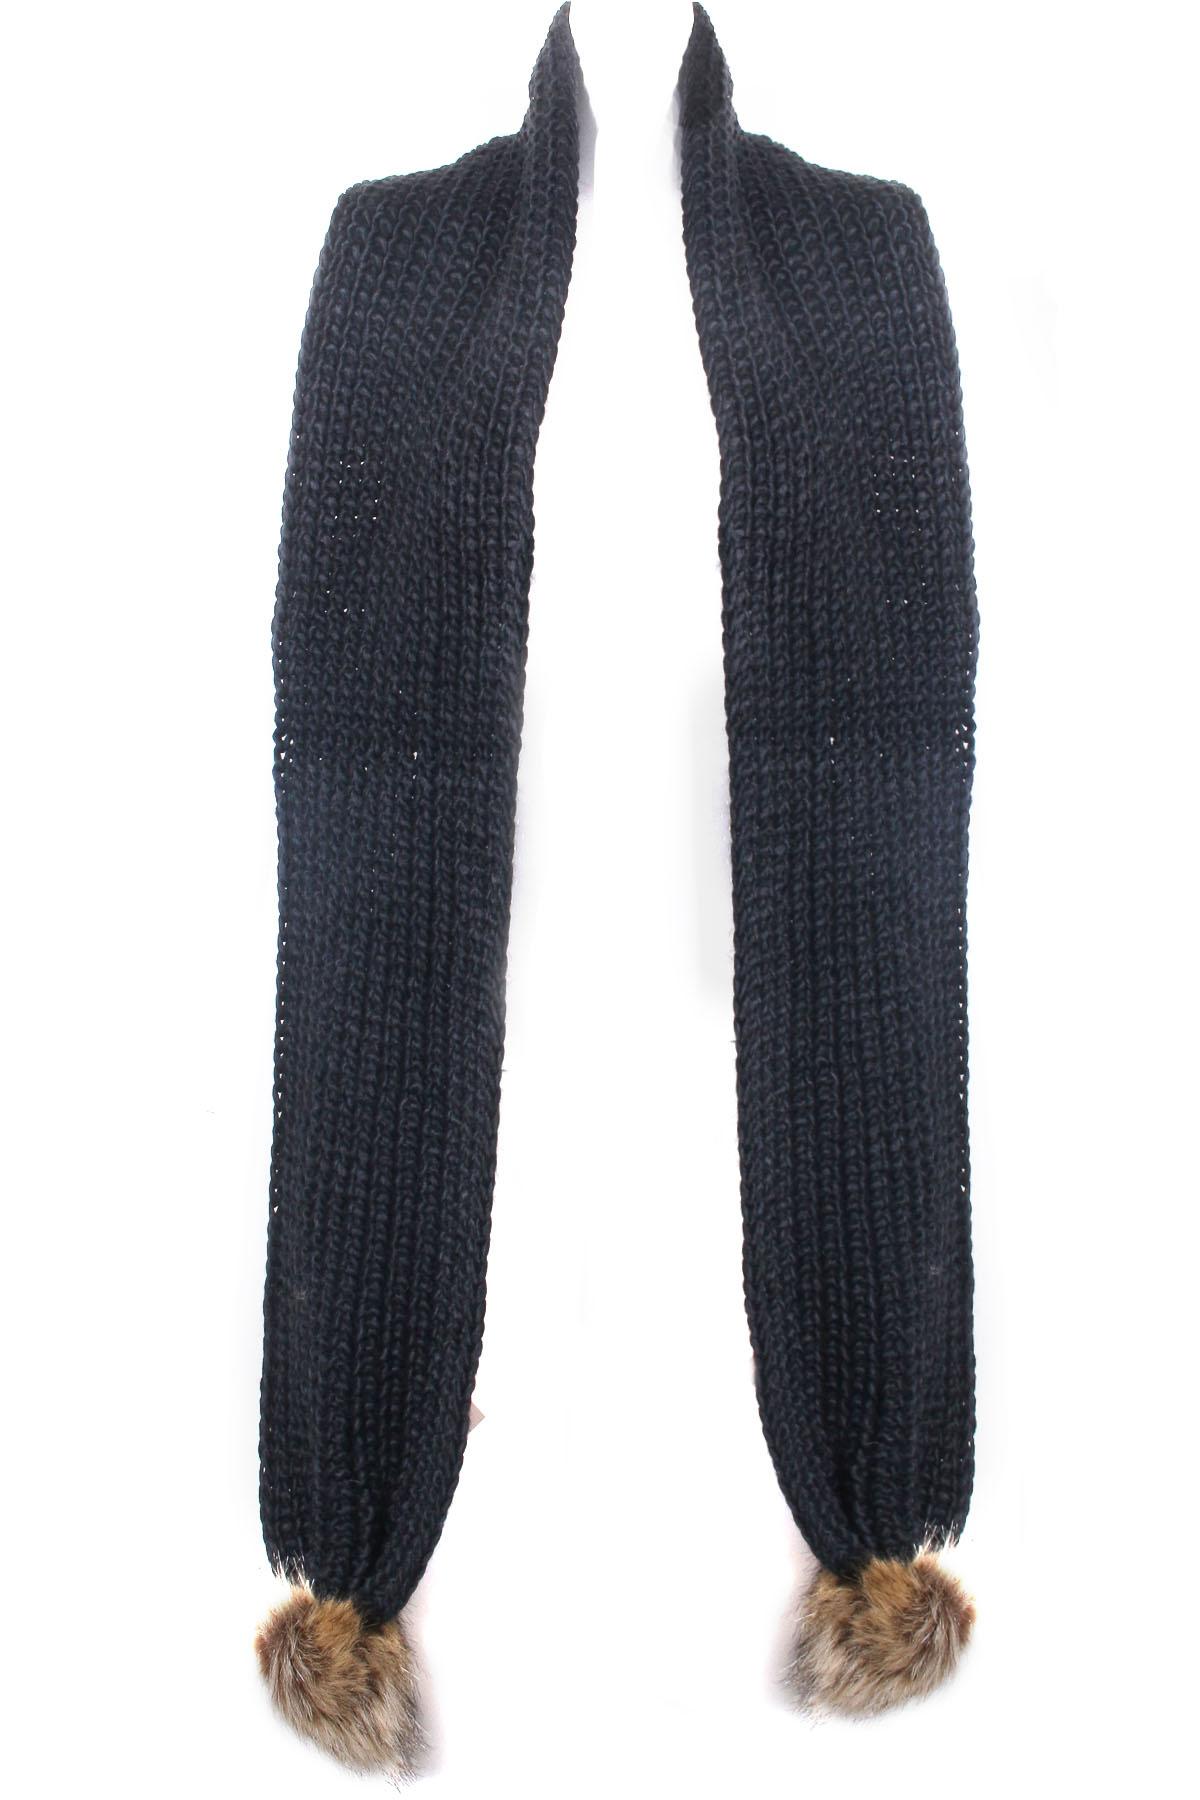 Knit Pom Pom Scarf - Scarves